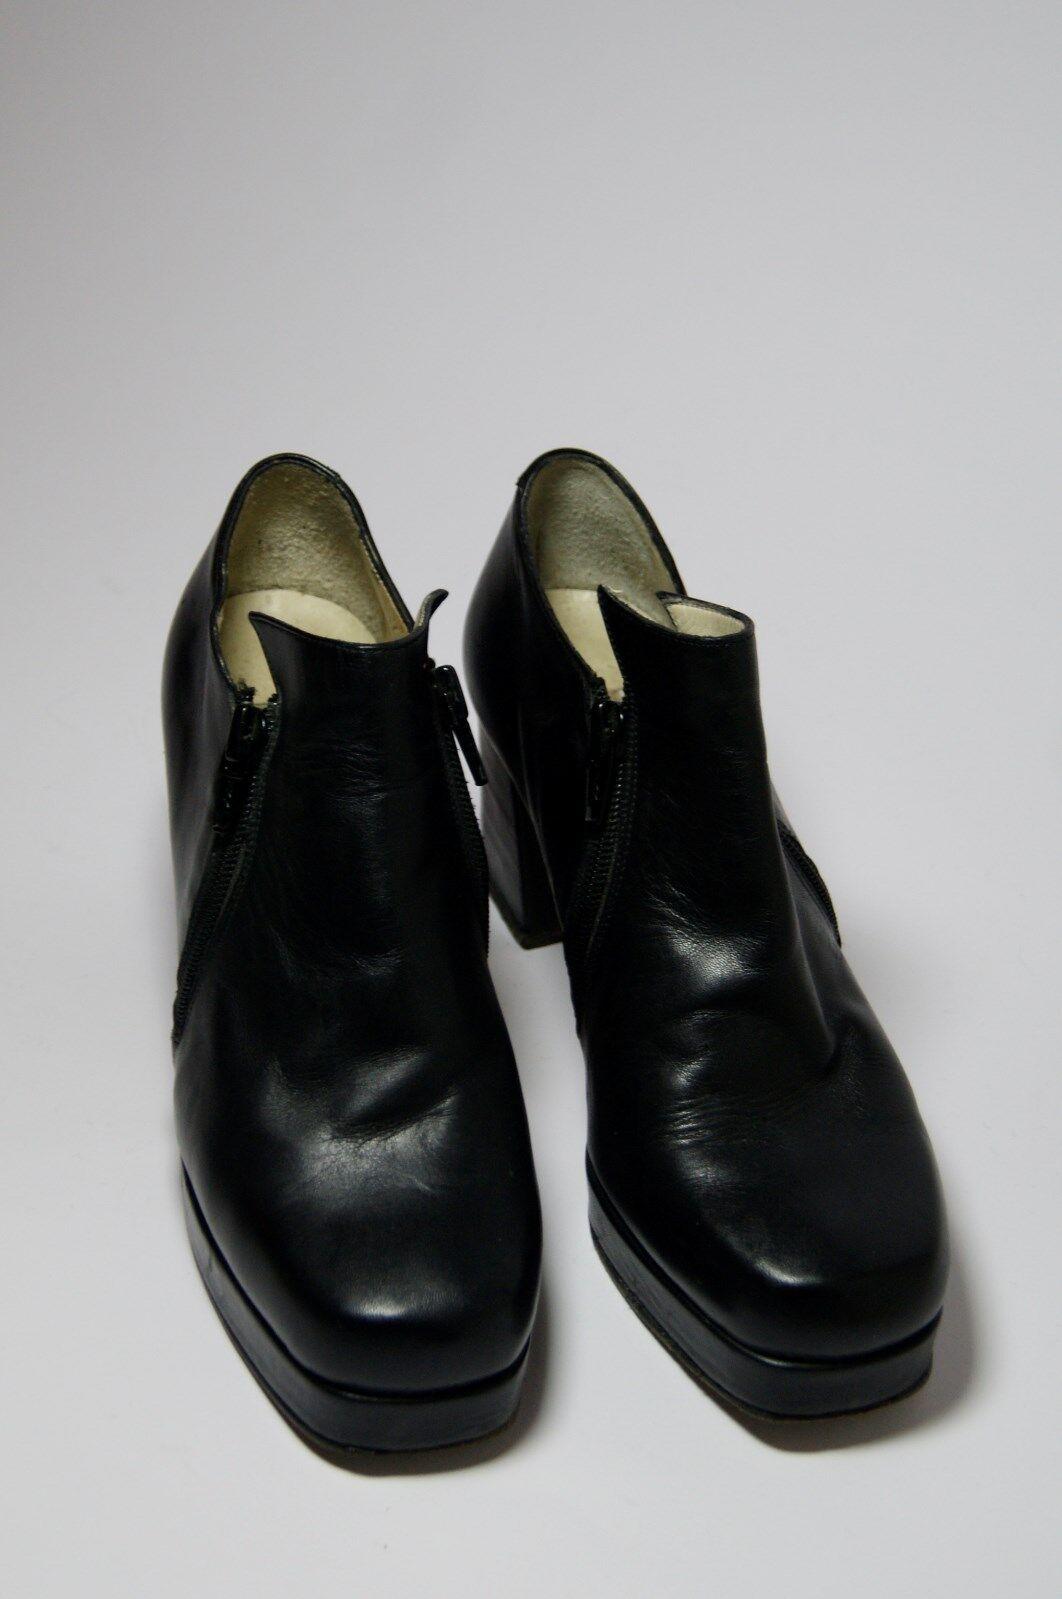 Alfonso Garlando Edel Plateau Pumps Stiefel Schuhe Absatz 70 mm Leder schwarz